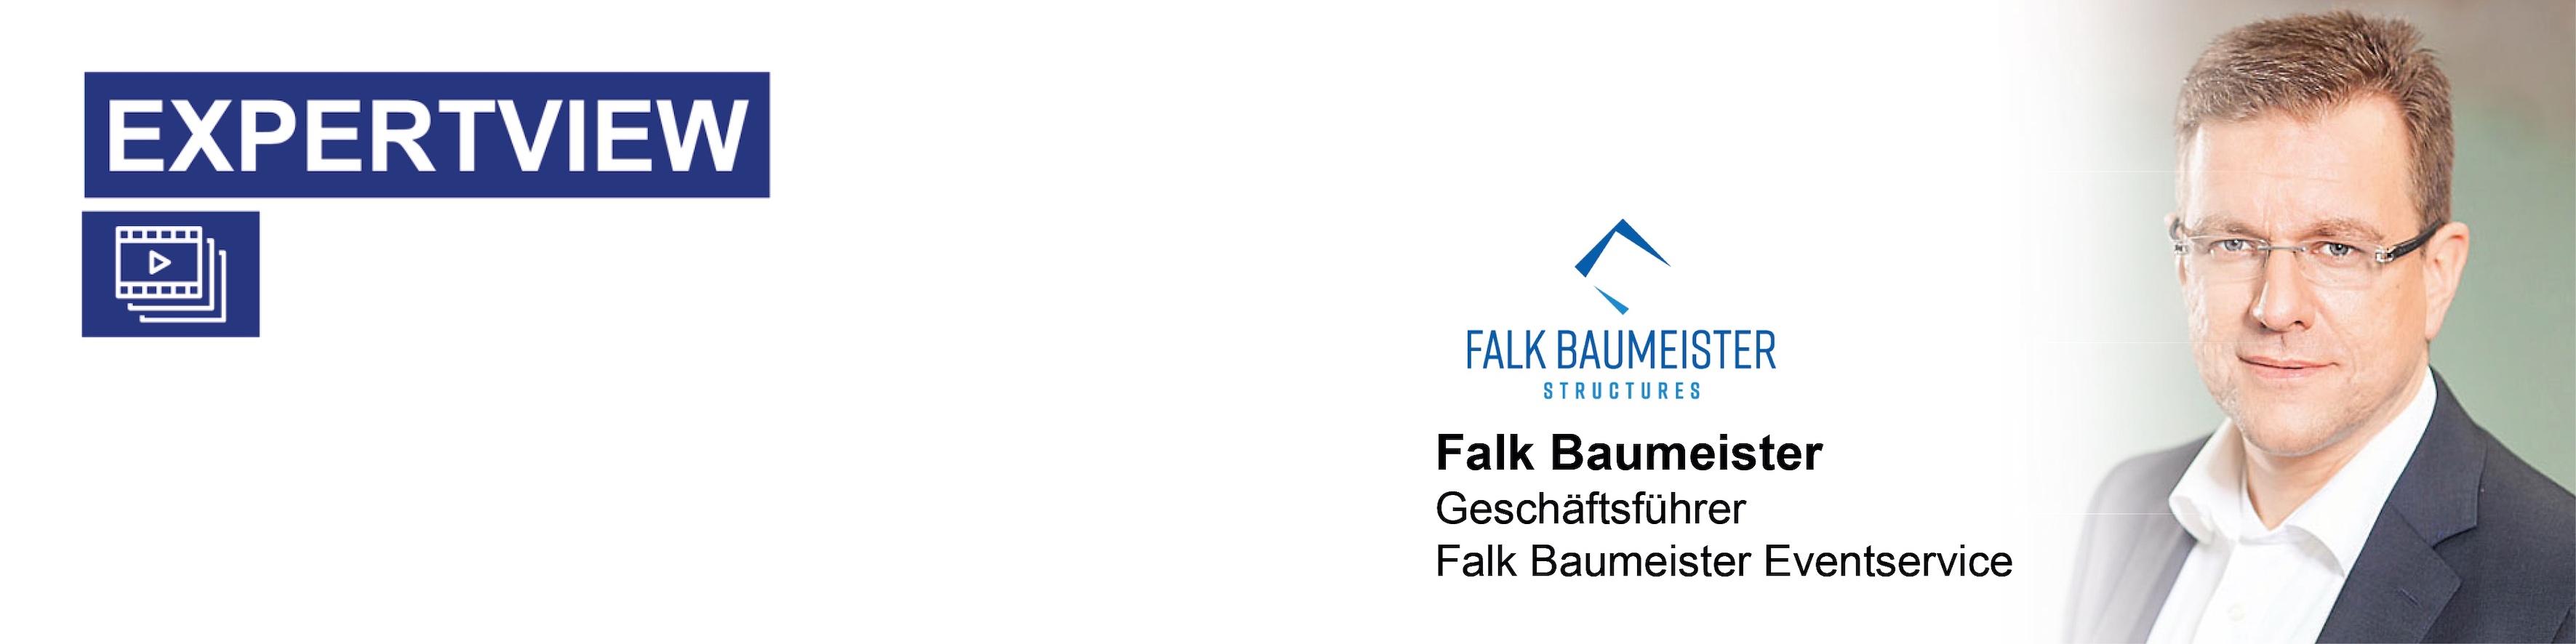 header_falk_baumeister